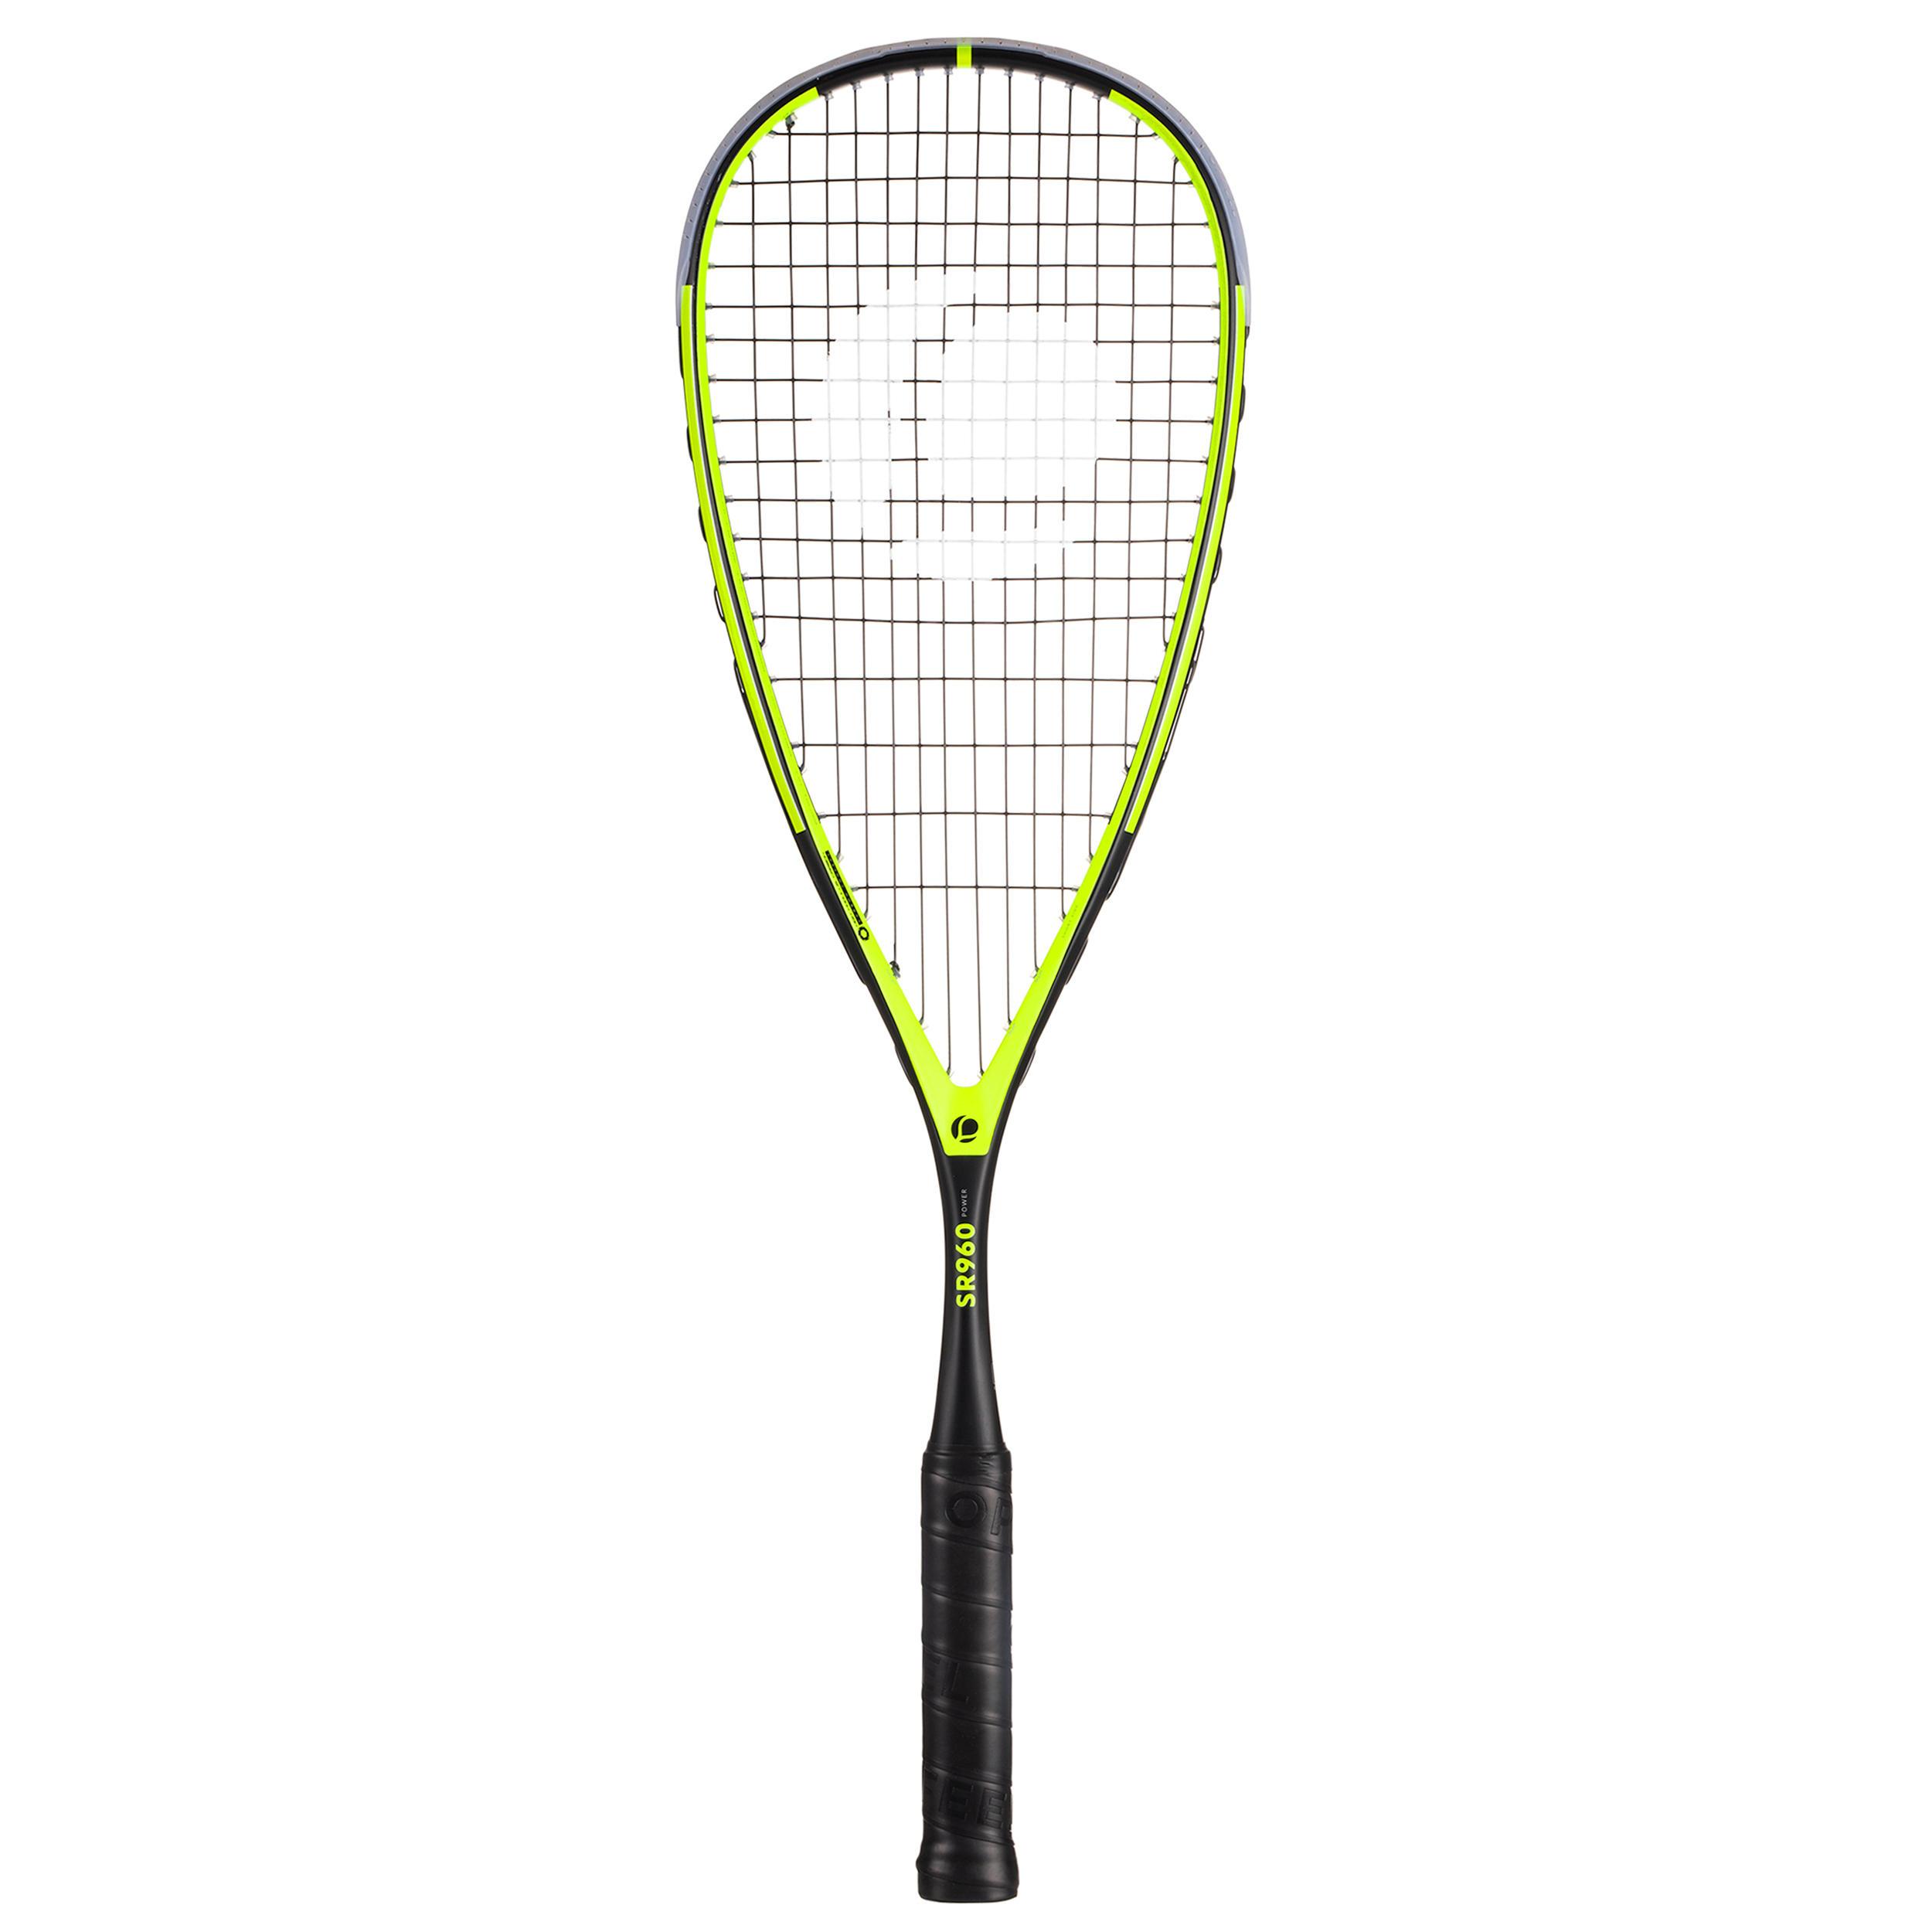 Rachetă Squash SR960 POWER